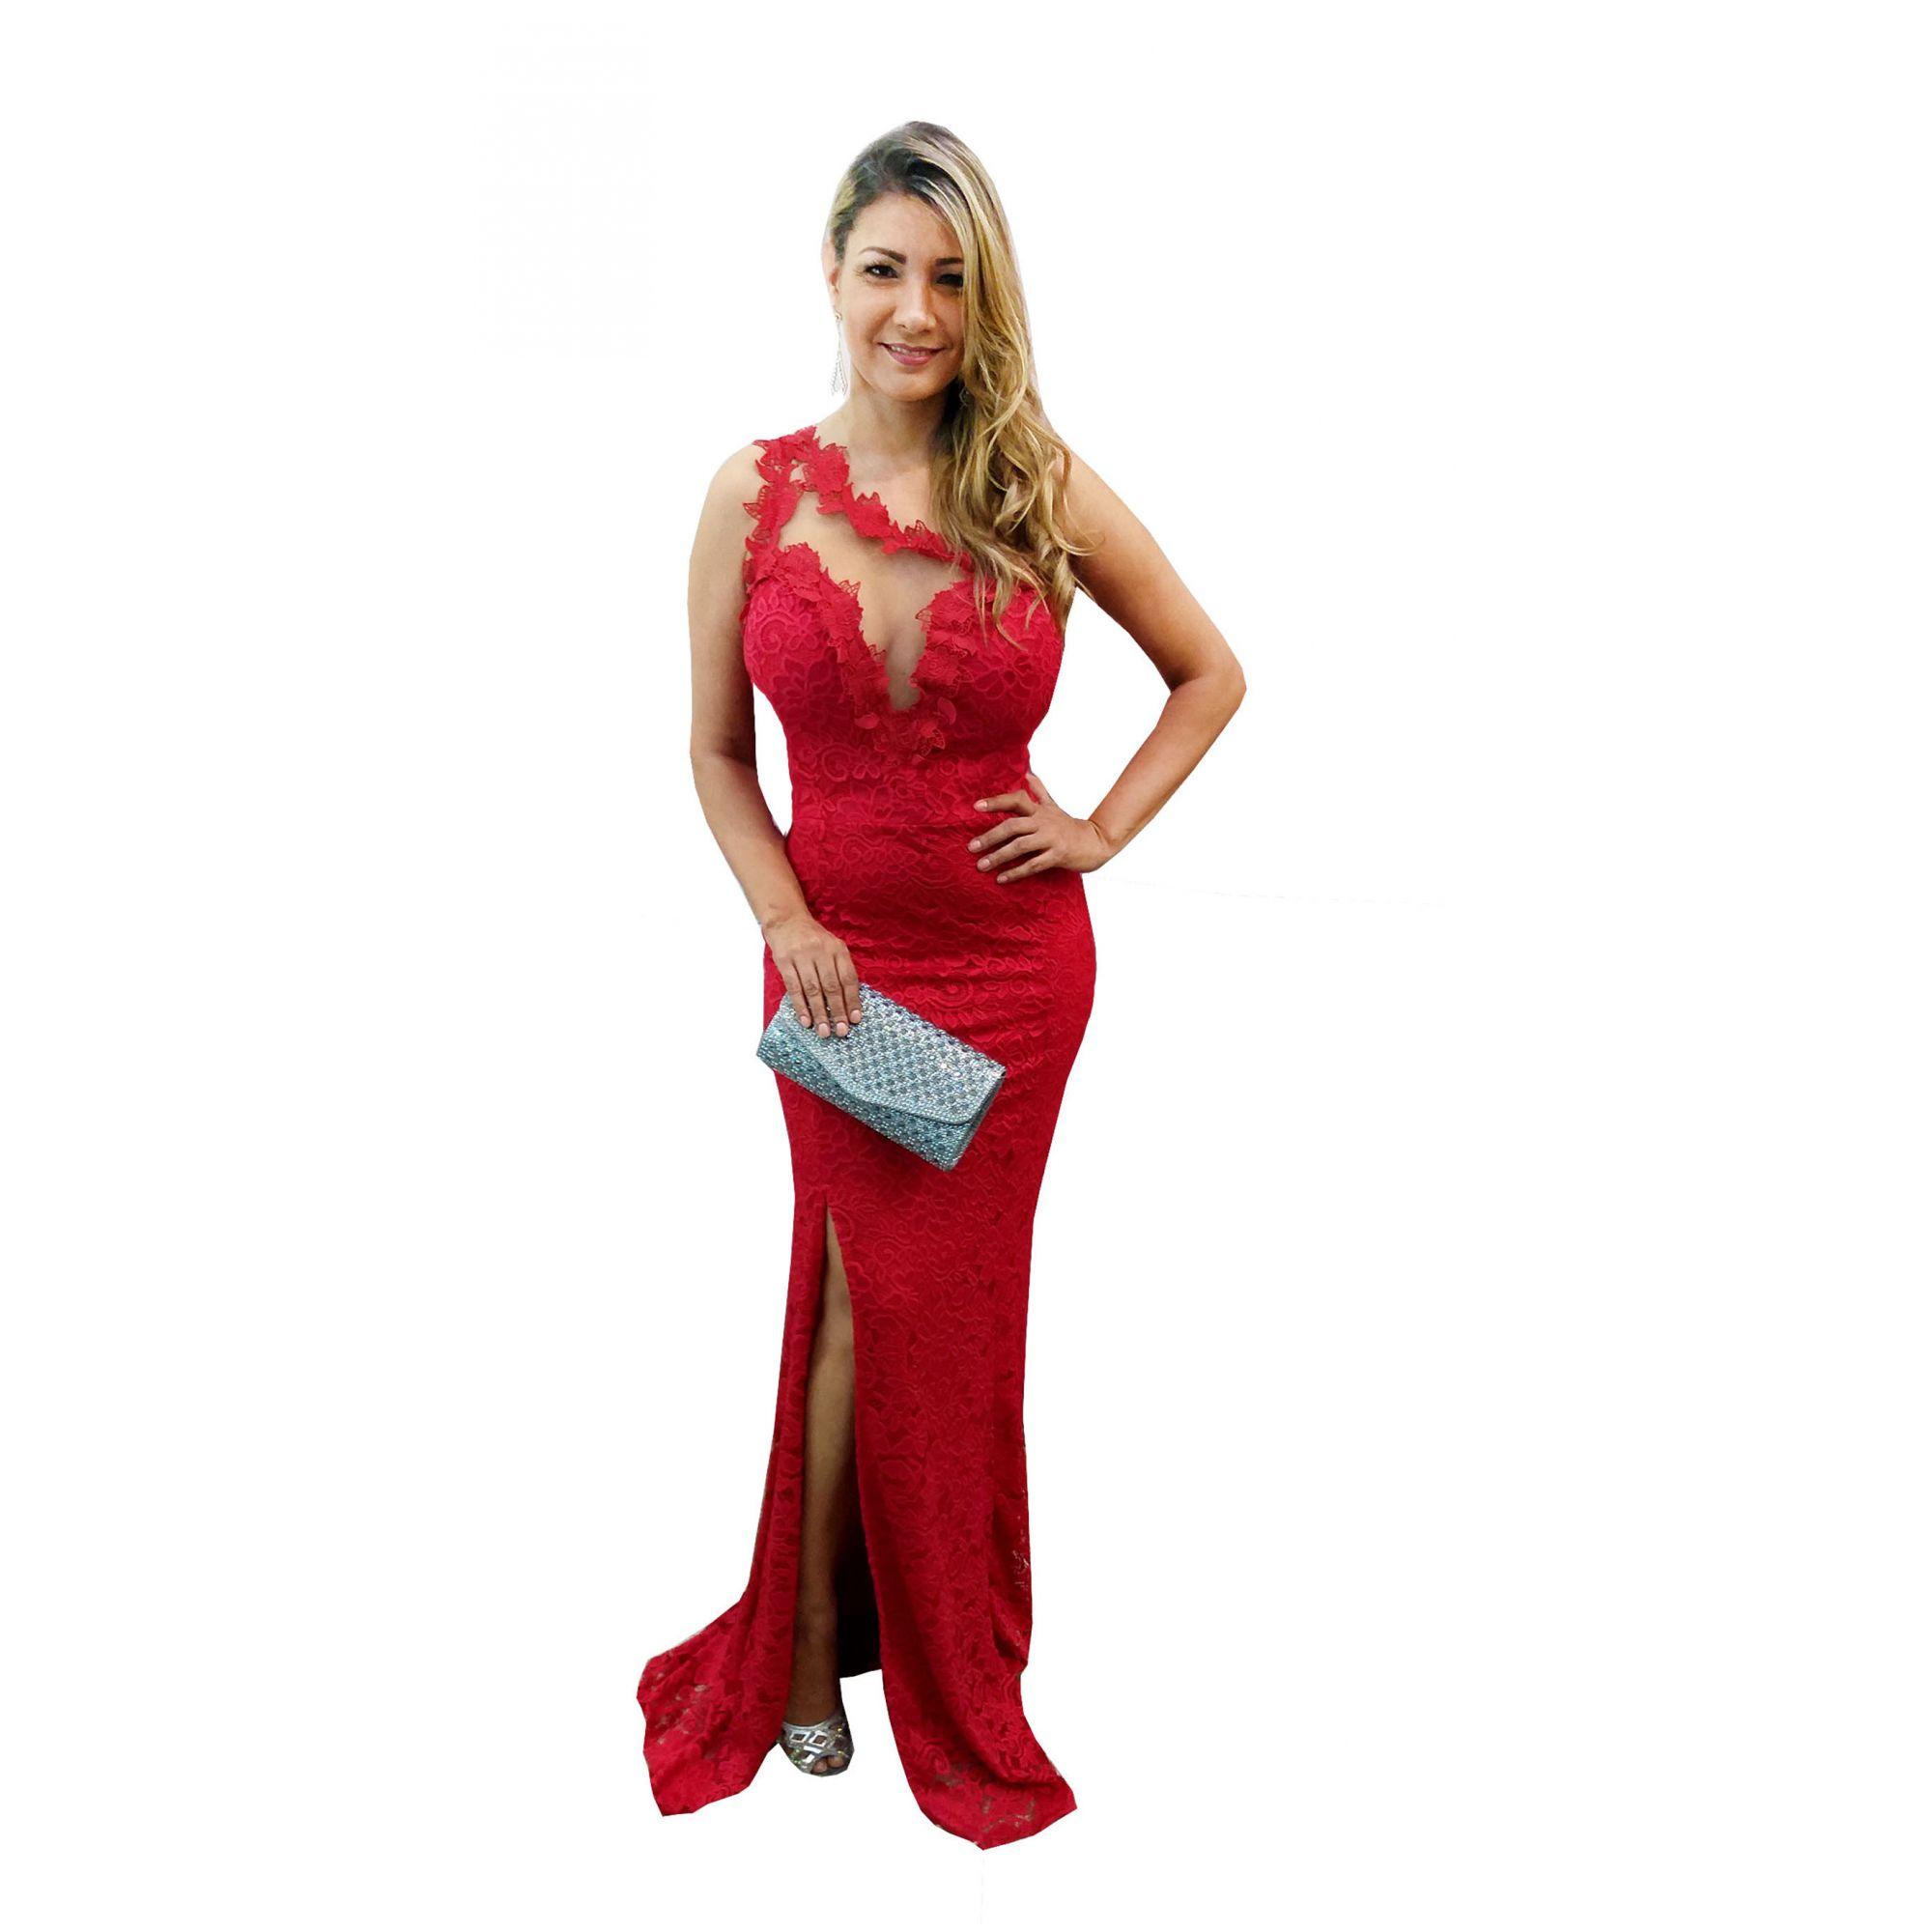 892583ec1 Vestido de Festa Renda Vermelho - Fenda